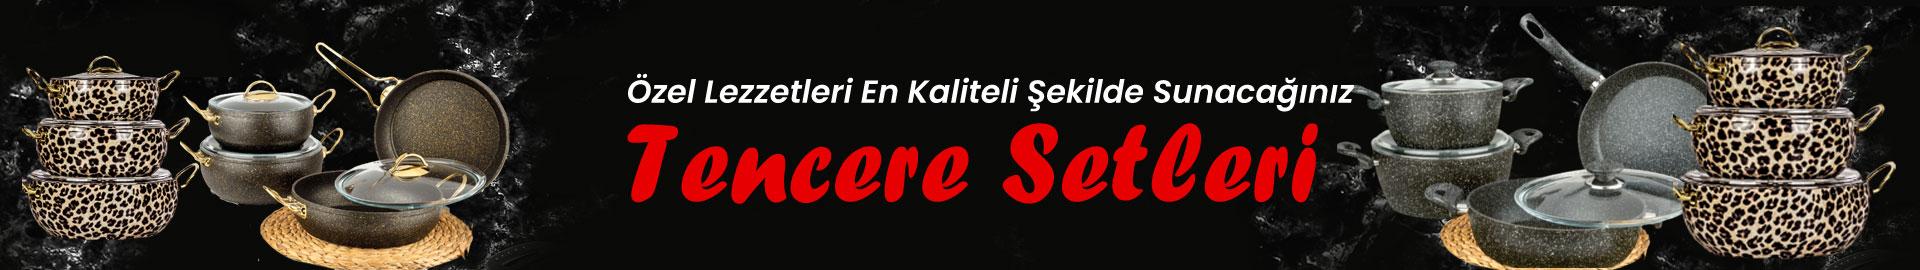 TENCERE SETLERİ